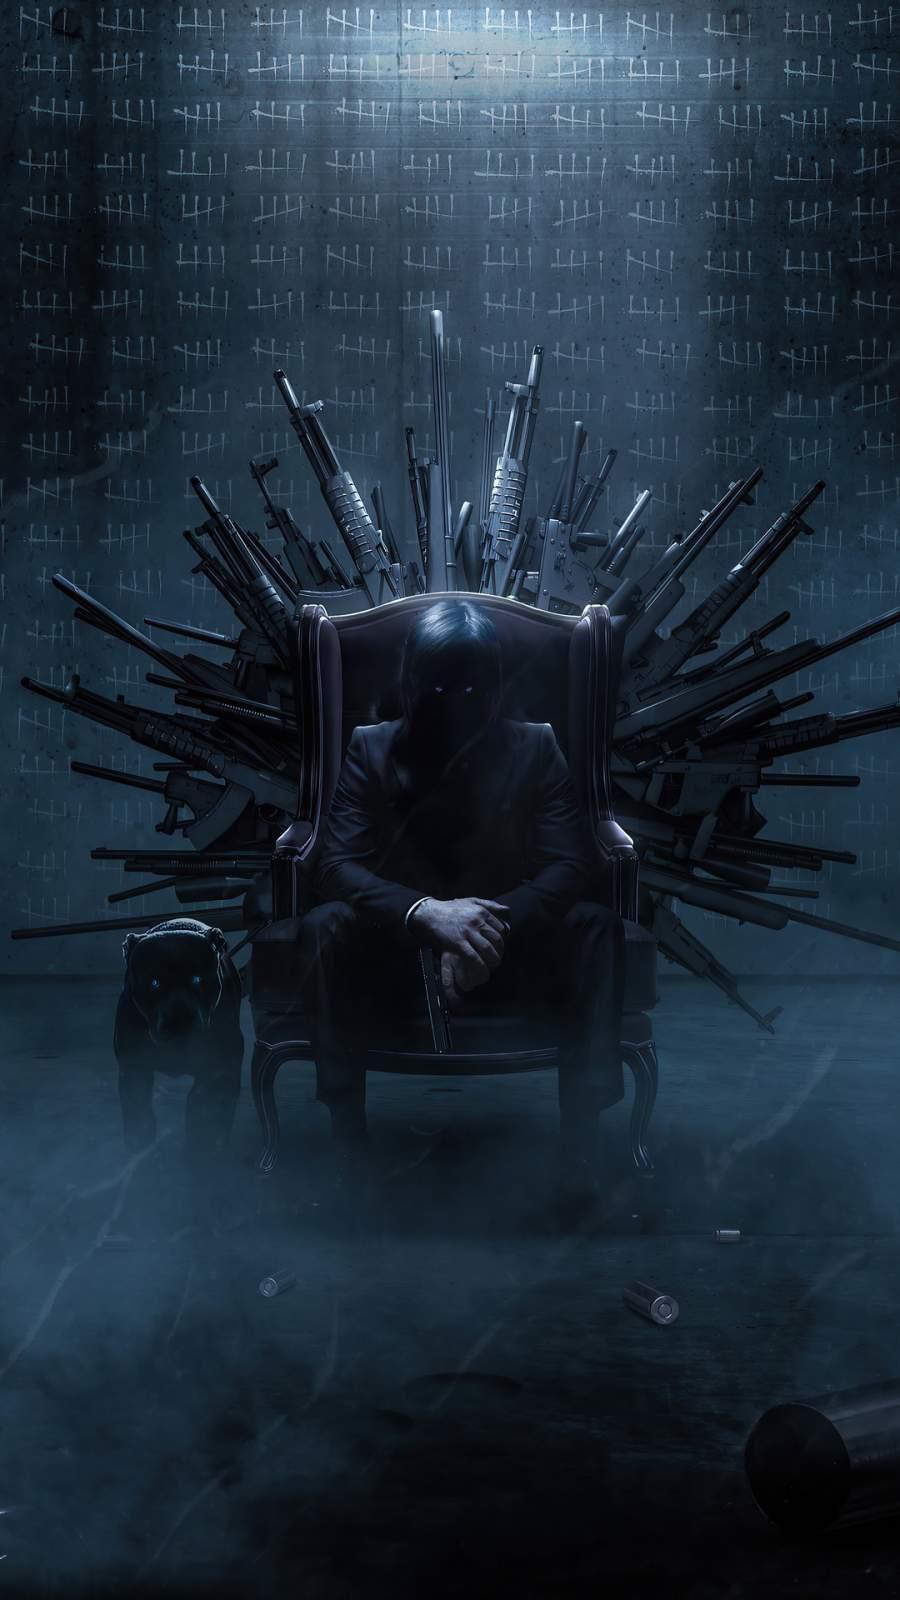 John Wick Throne